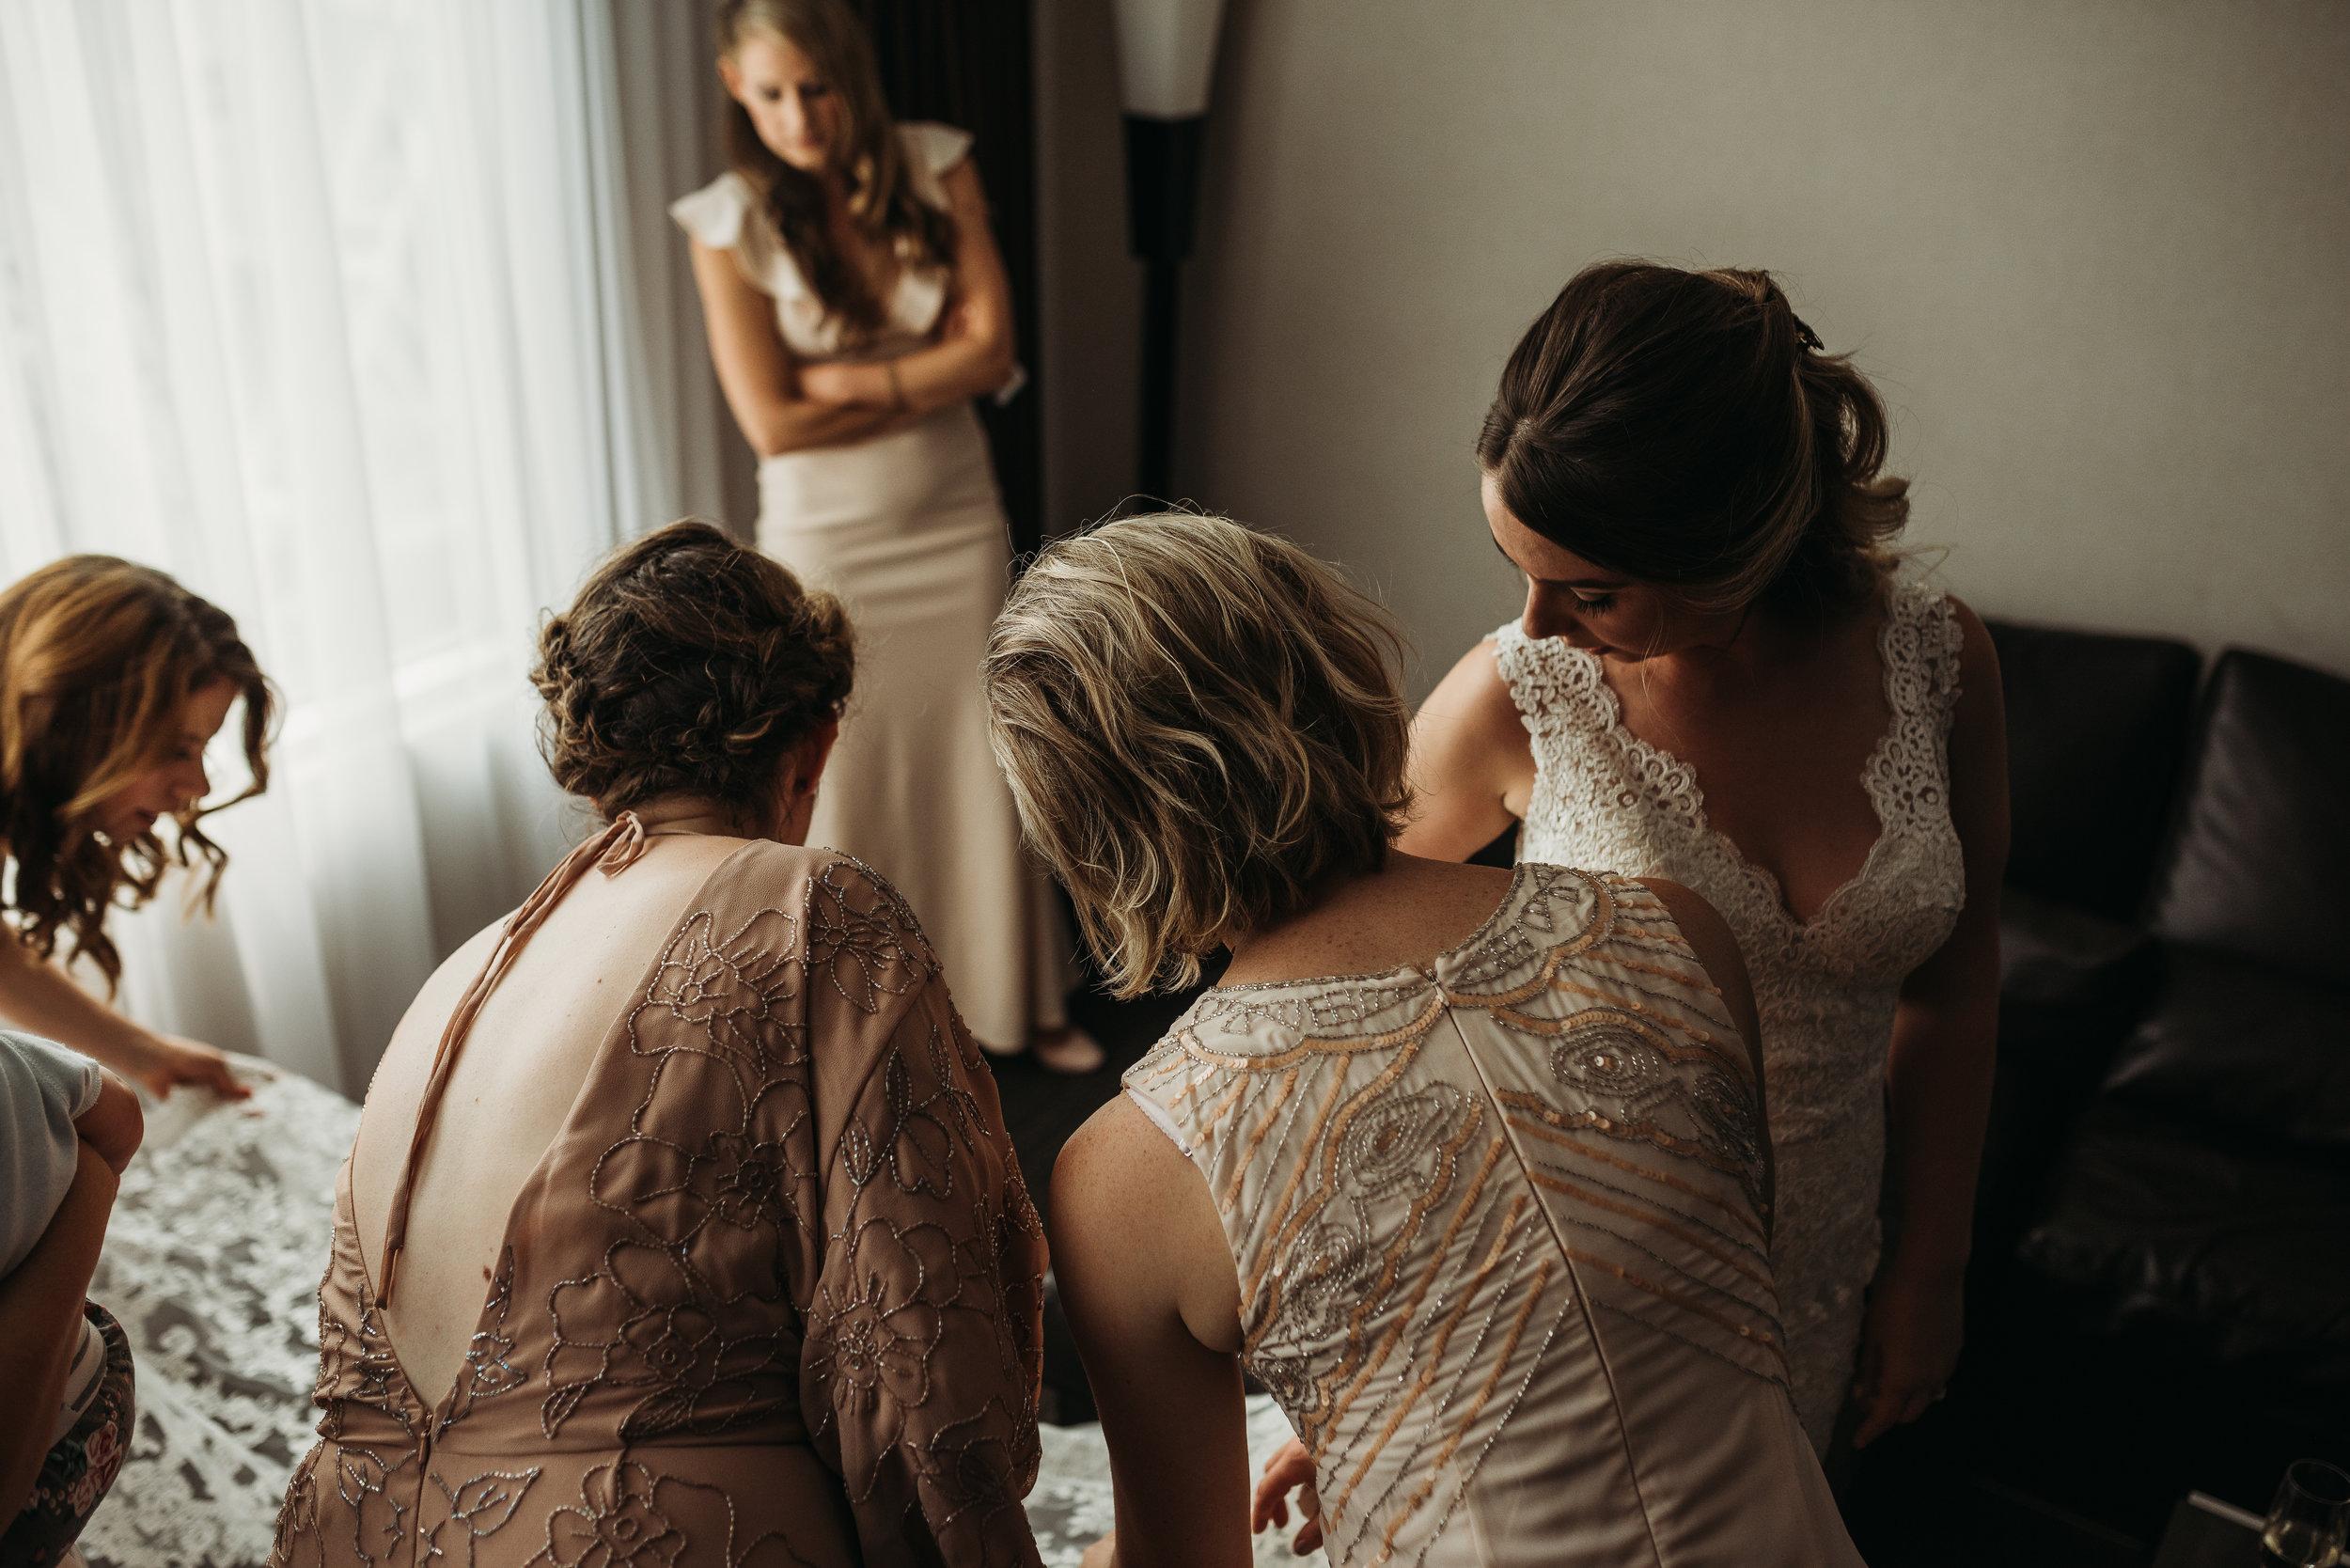 bride-getting-ready-photos-toronto-rustic-boho-airship37-wedding-by-willow-birch-photo-toronto-documentary-wedding-photographers.jpg